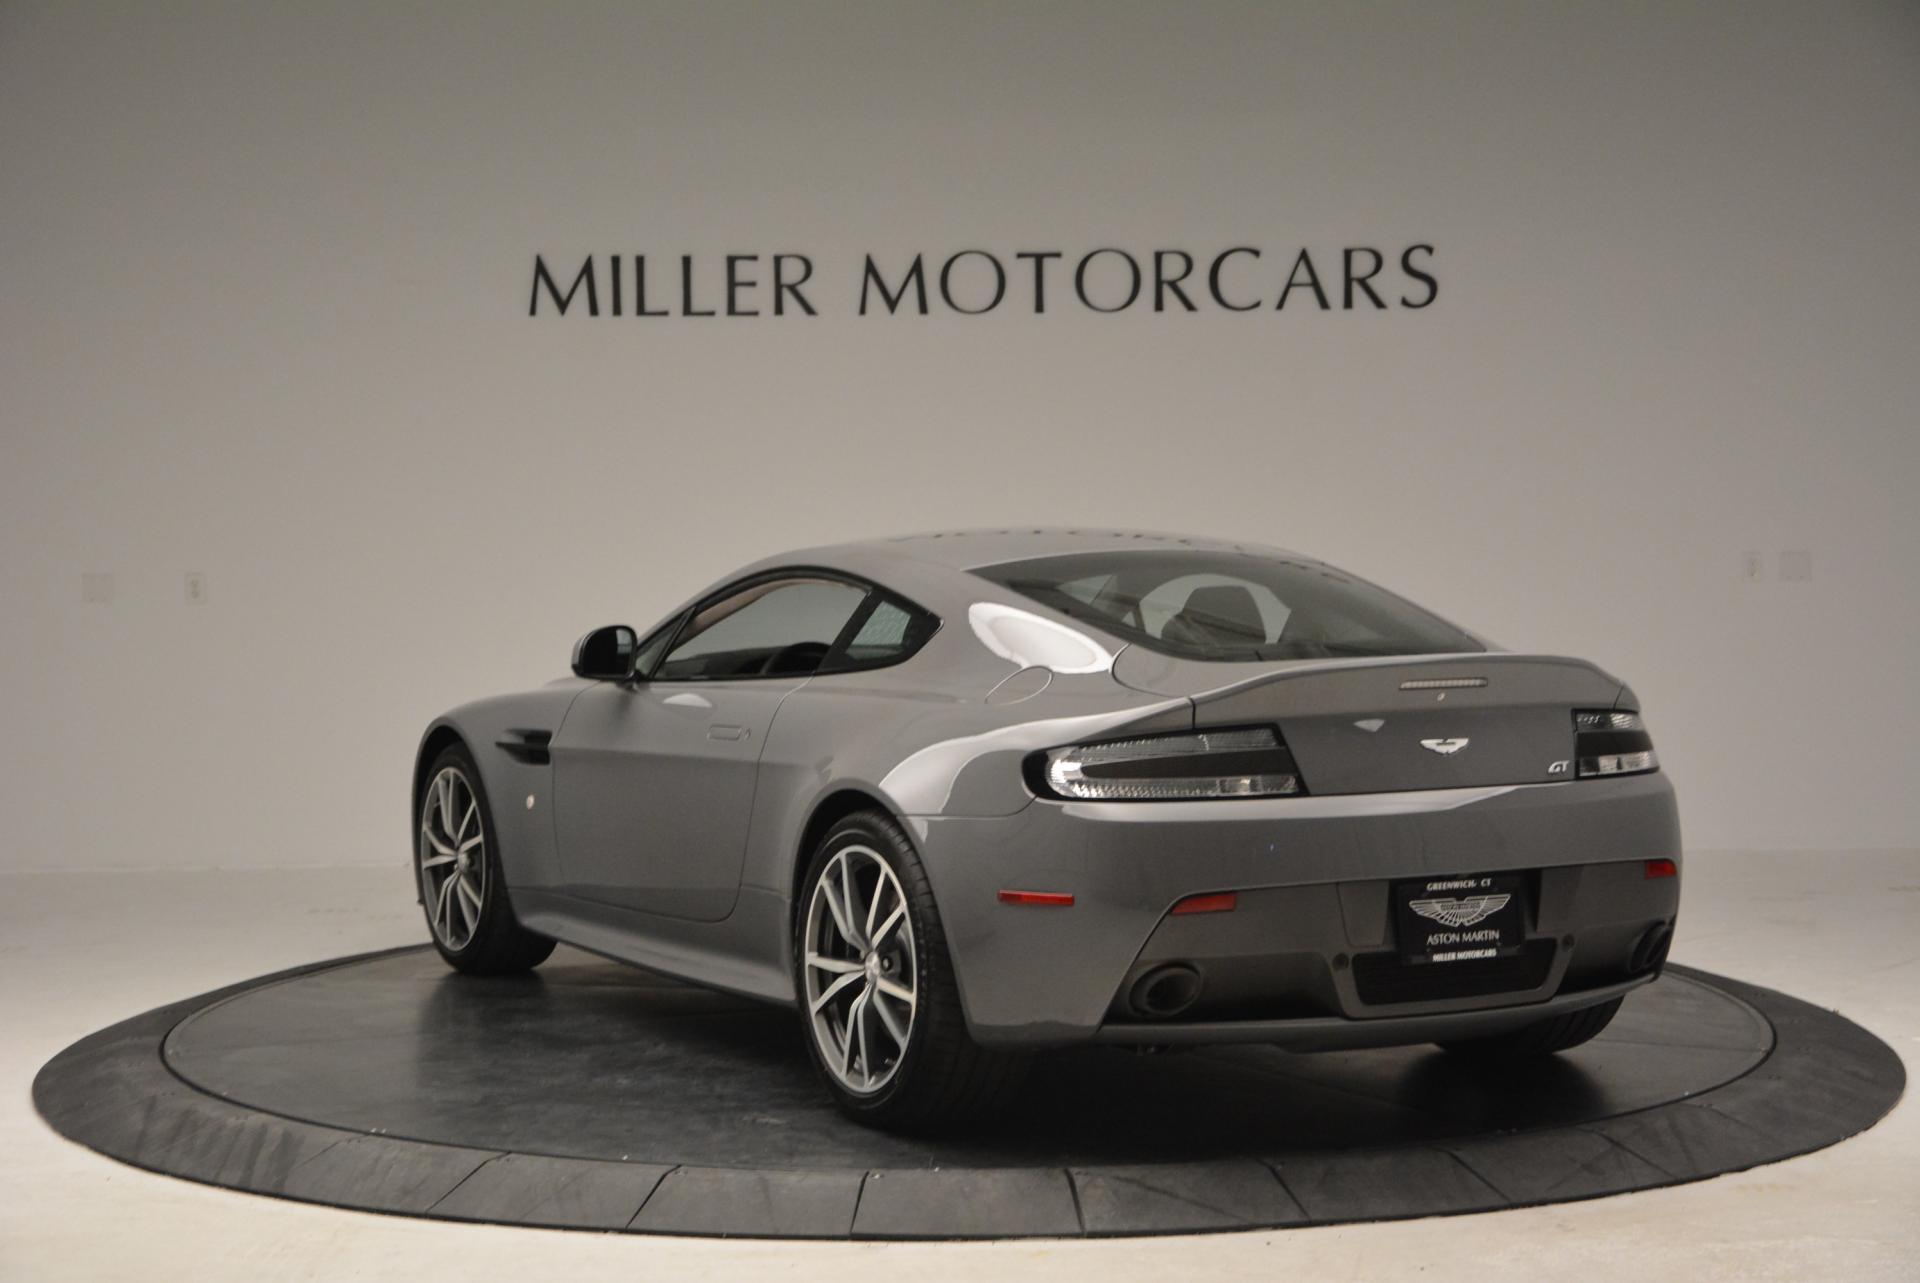 New 2016 Aston Martin Vantage GT  For Sale In Westport, CT 100_p5